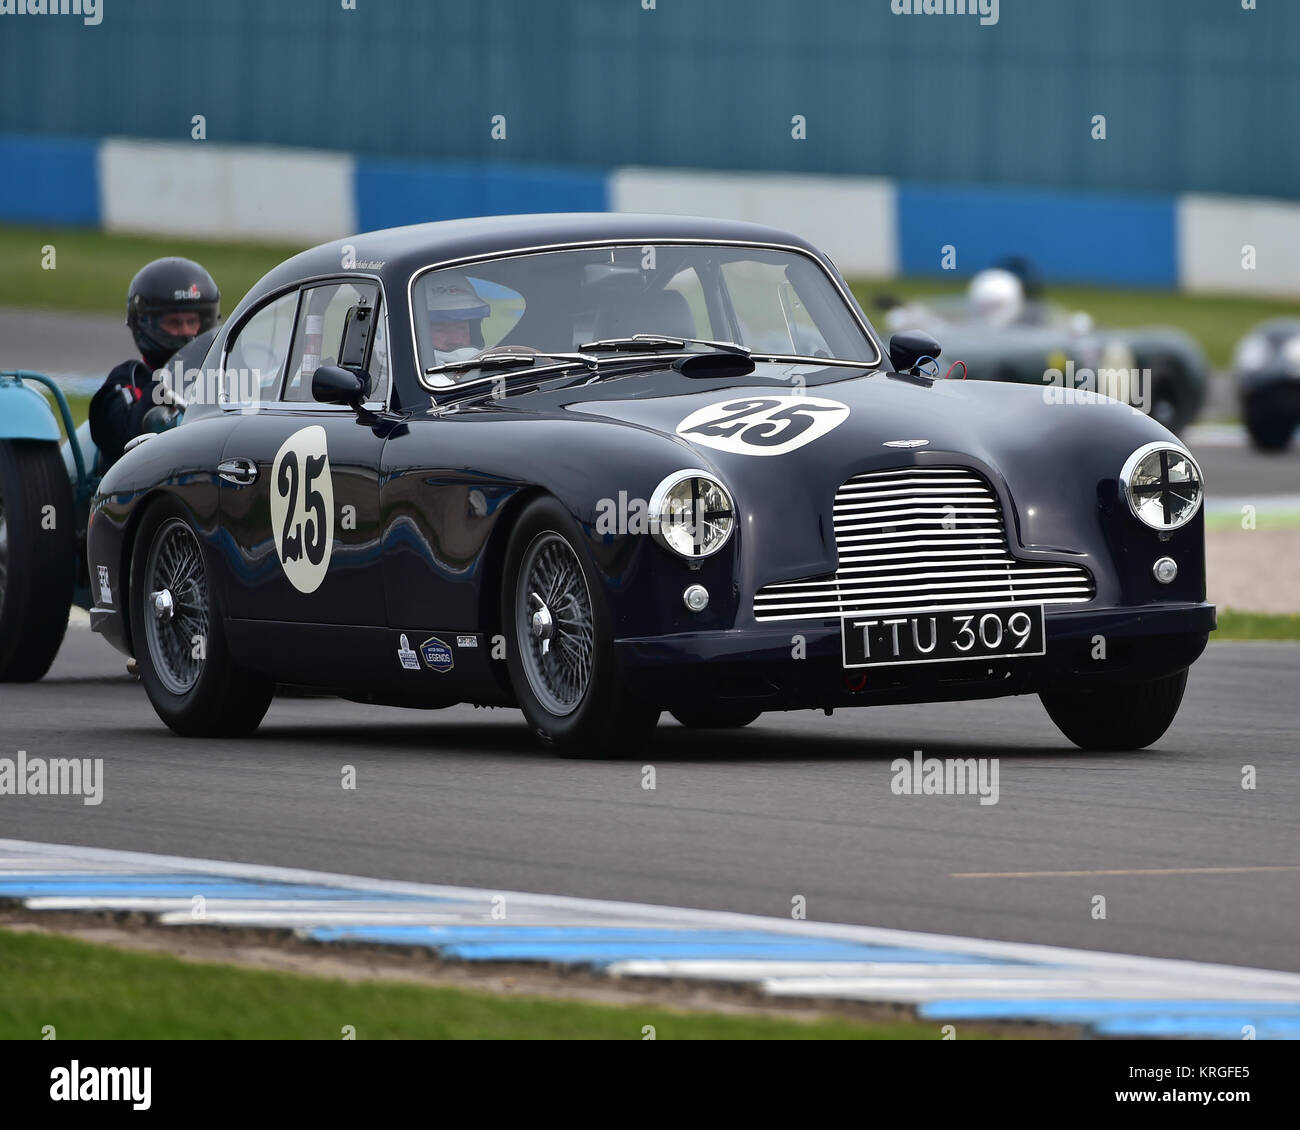 Nick Ruddell Aston Martin Db2 4 Mki Royal Automobile Club Rac Stock Photo Alamy